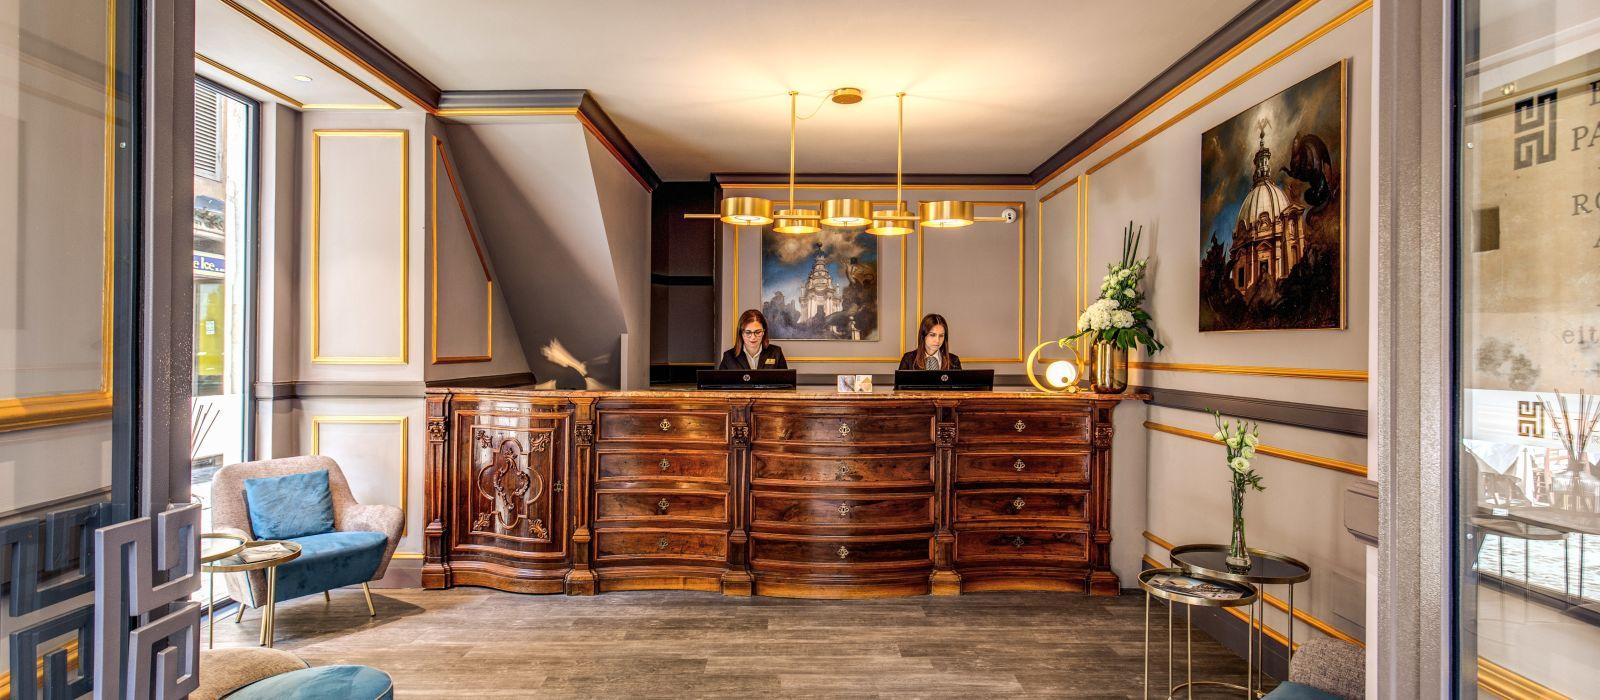 Hotel Eitch Borromini  Italy